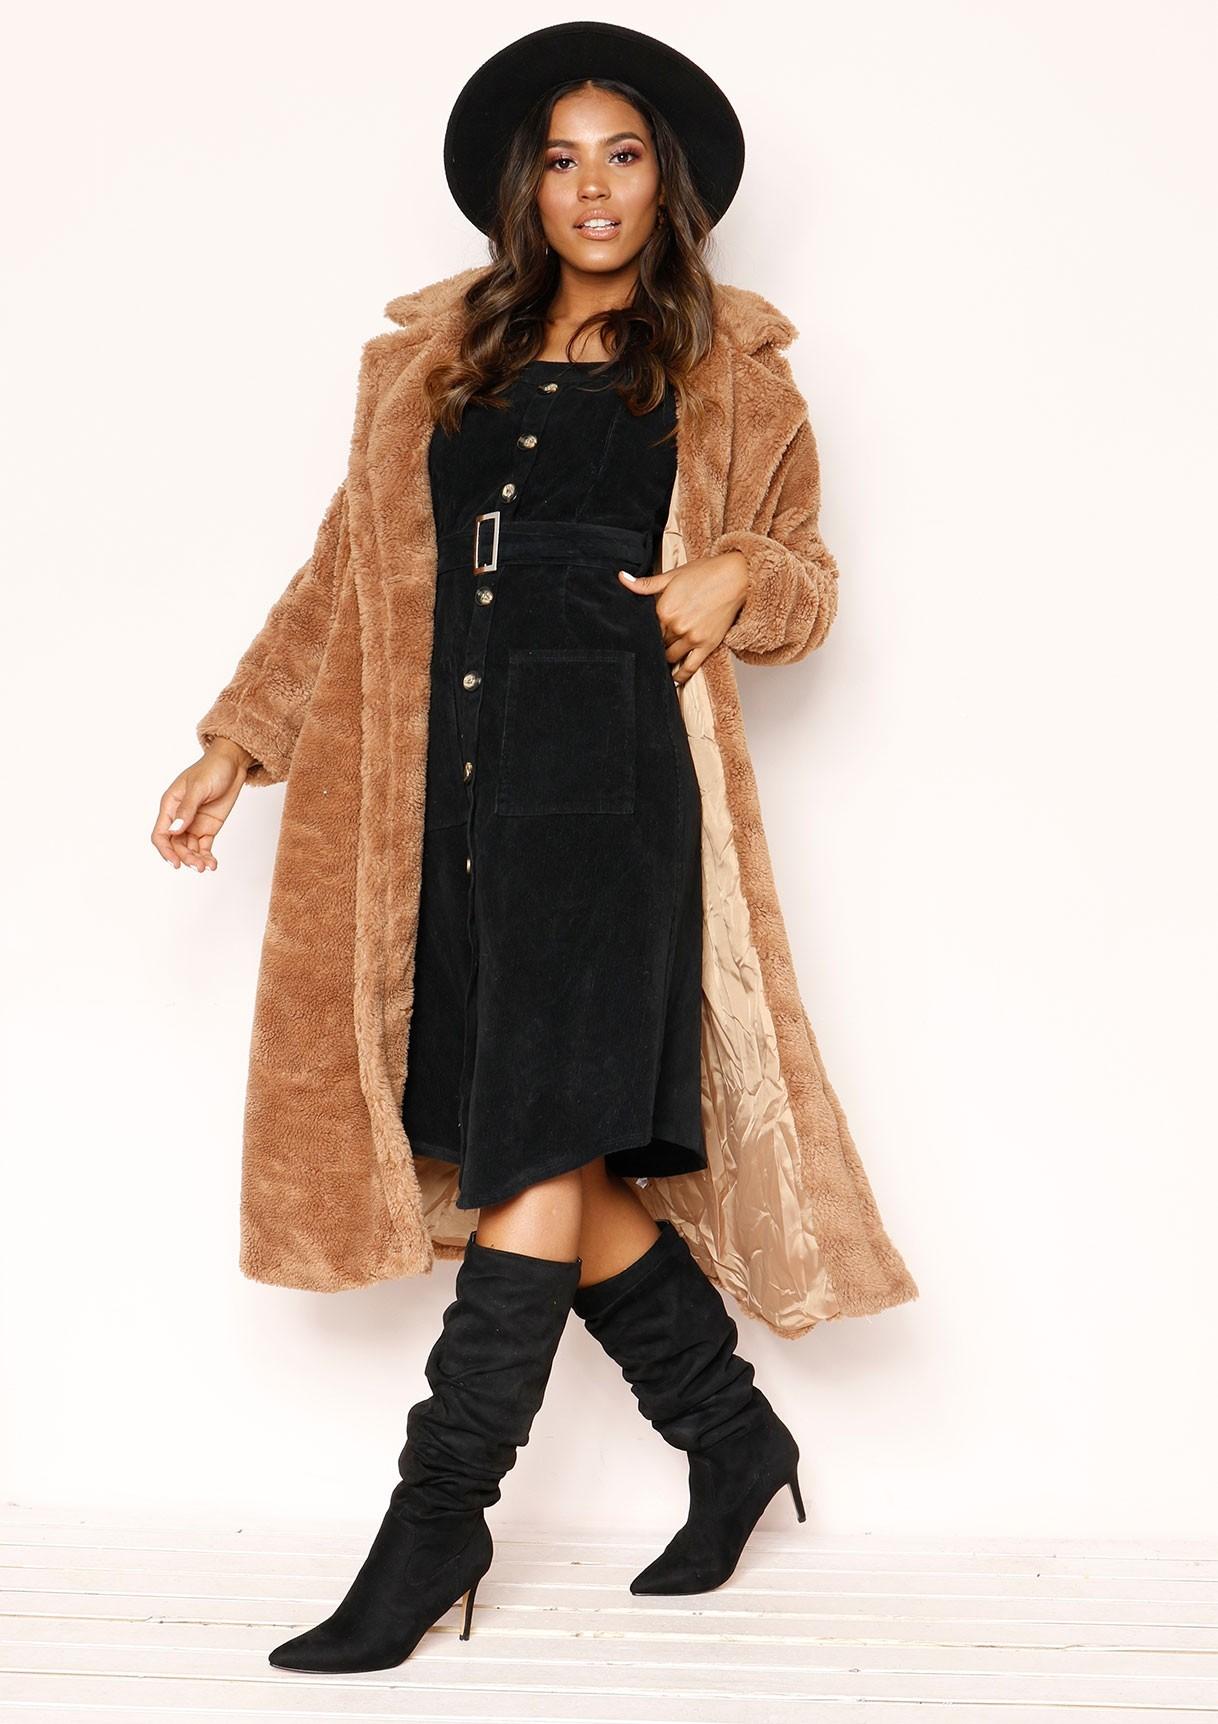 Arla Black Corduroy Button Up Dress